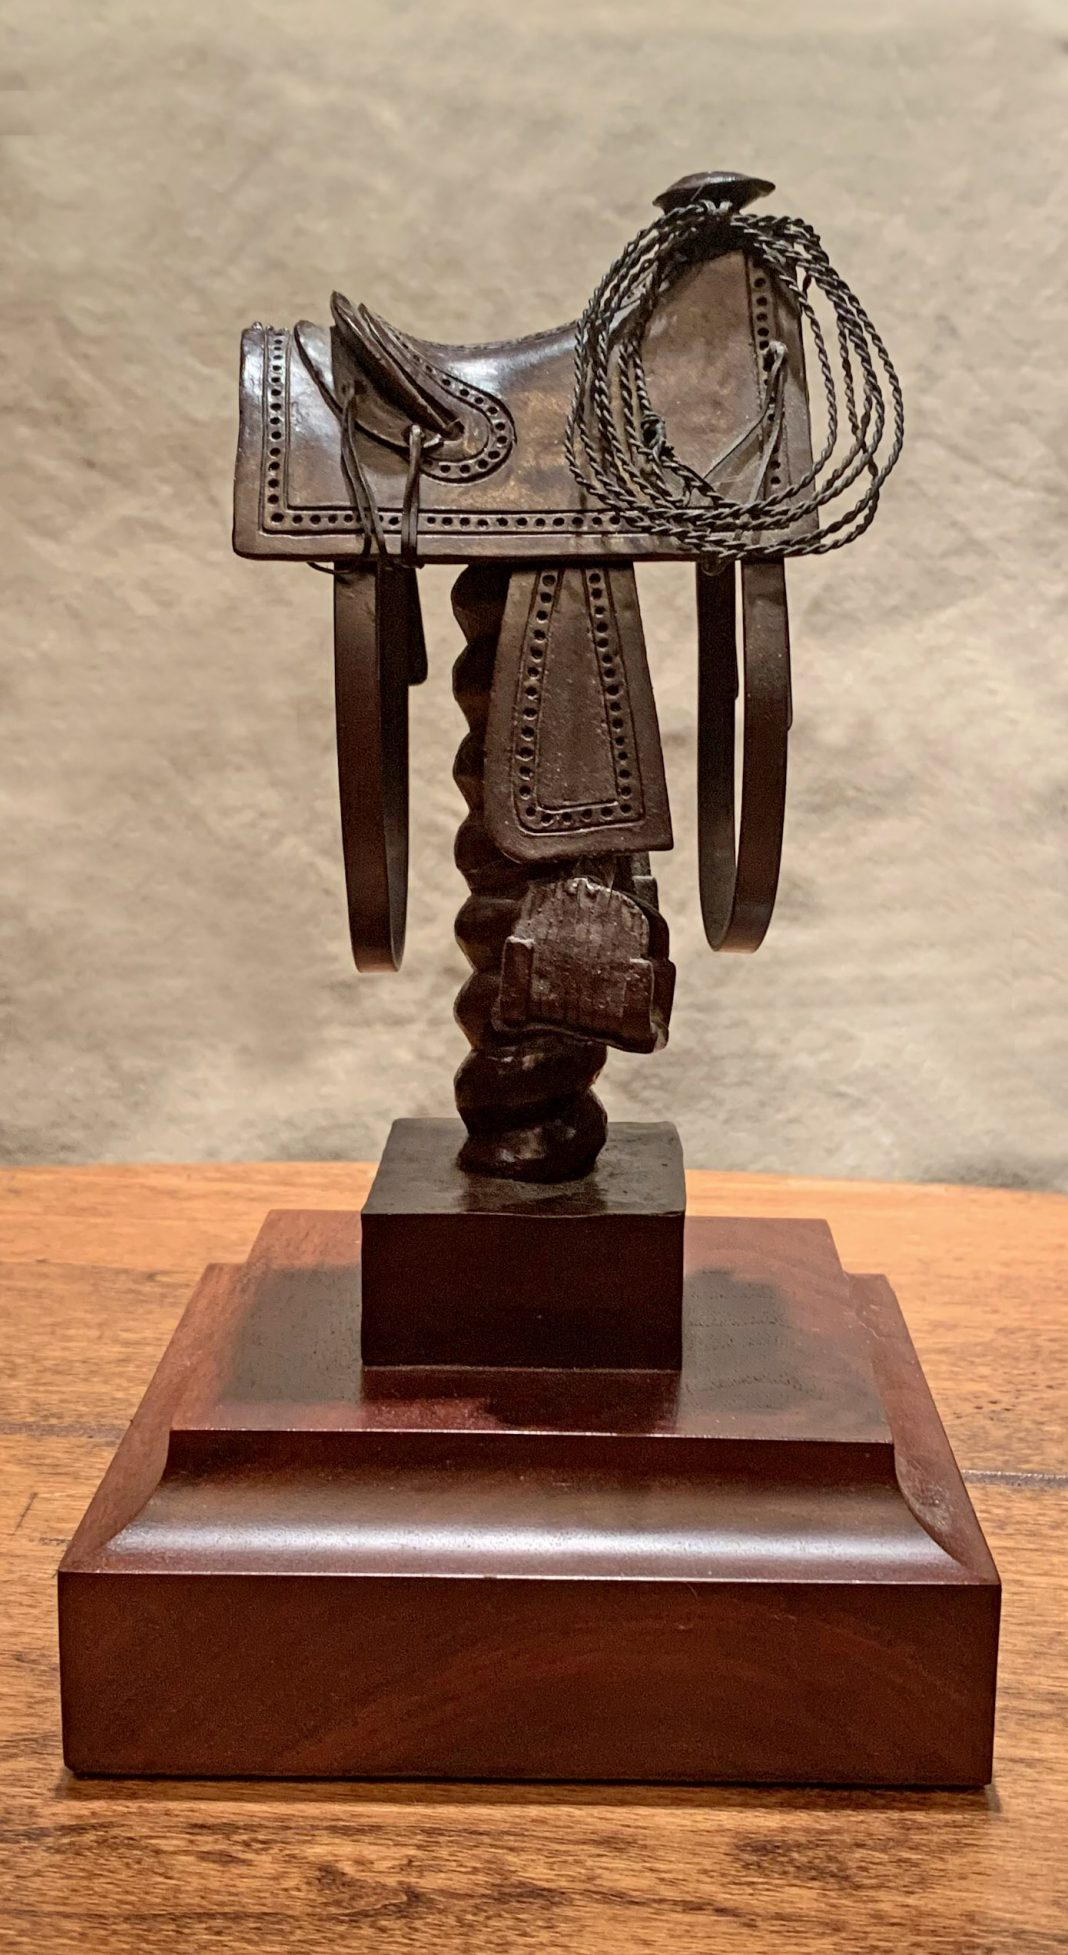 Rogers Aston Texas Saddle Circa 1860 cowboy saddle western bronze sculpture